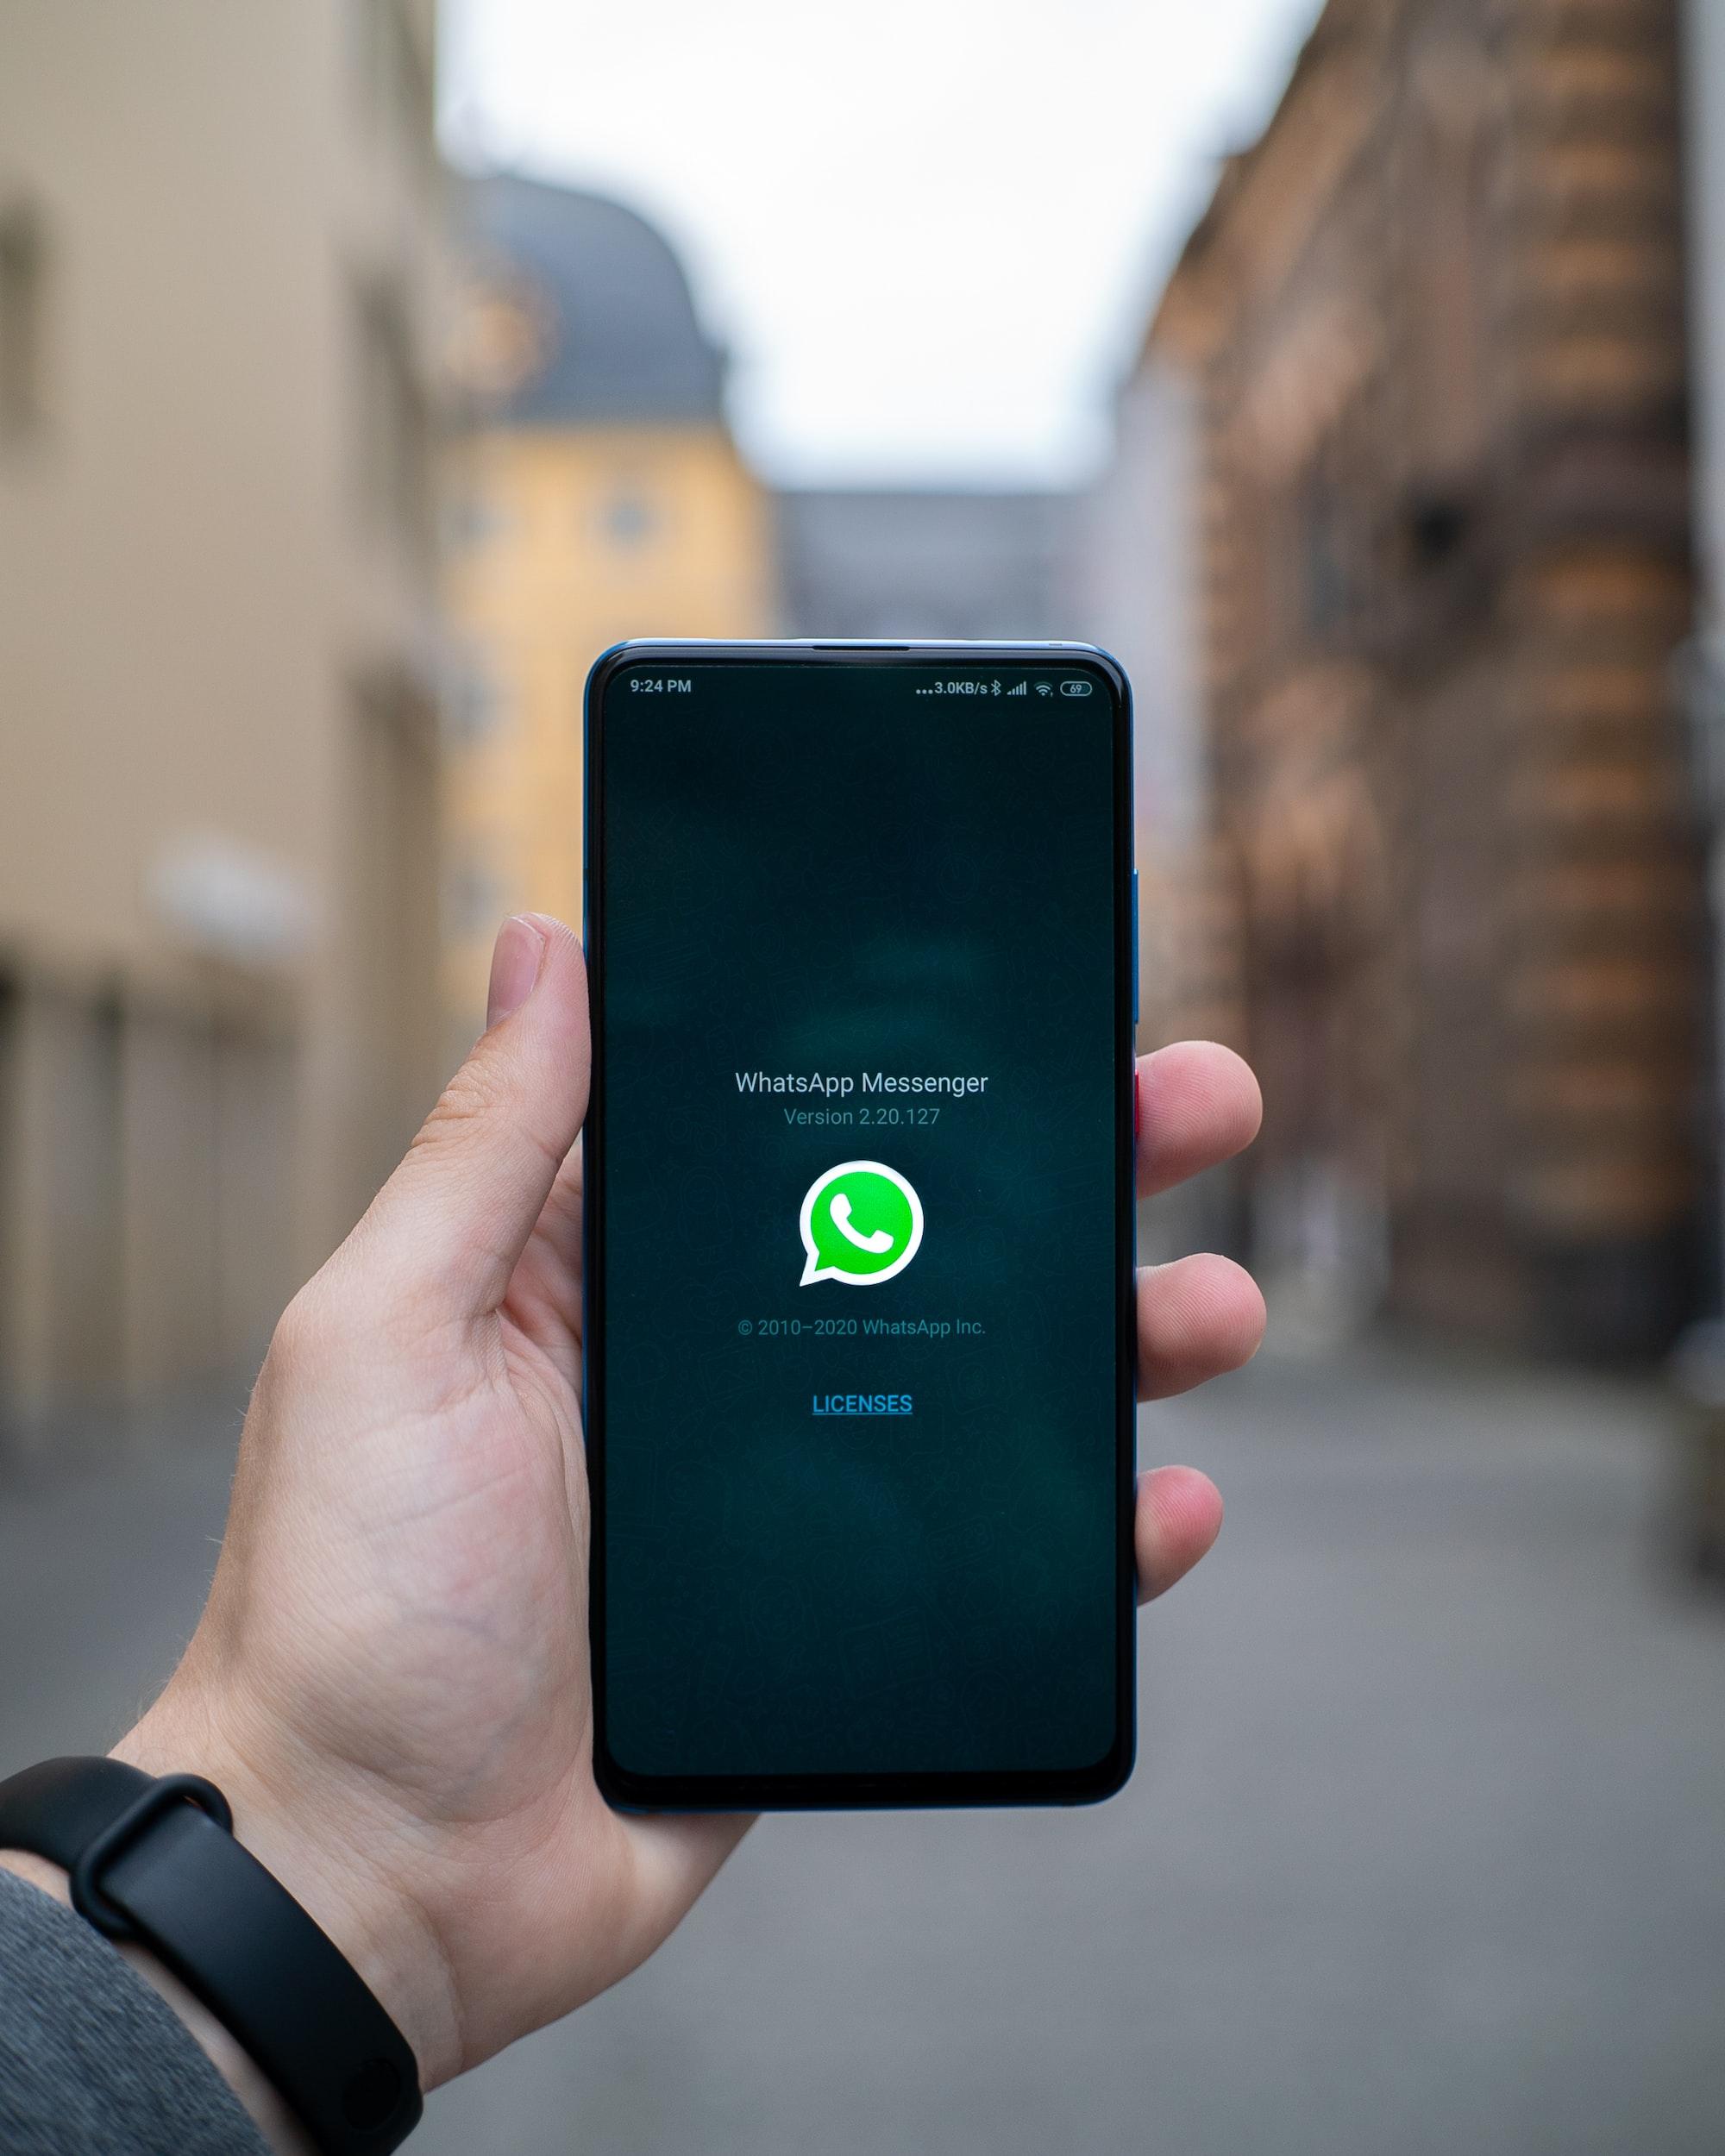 WhatsApp Messenger is like Social Networking